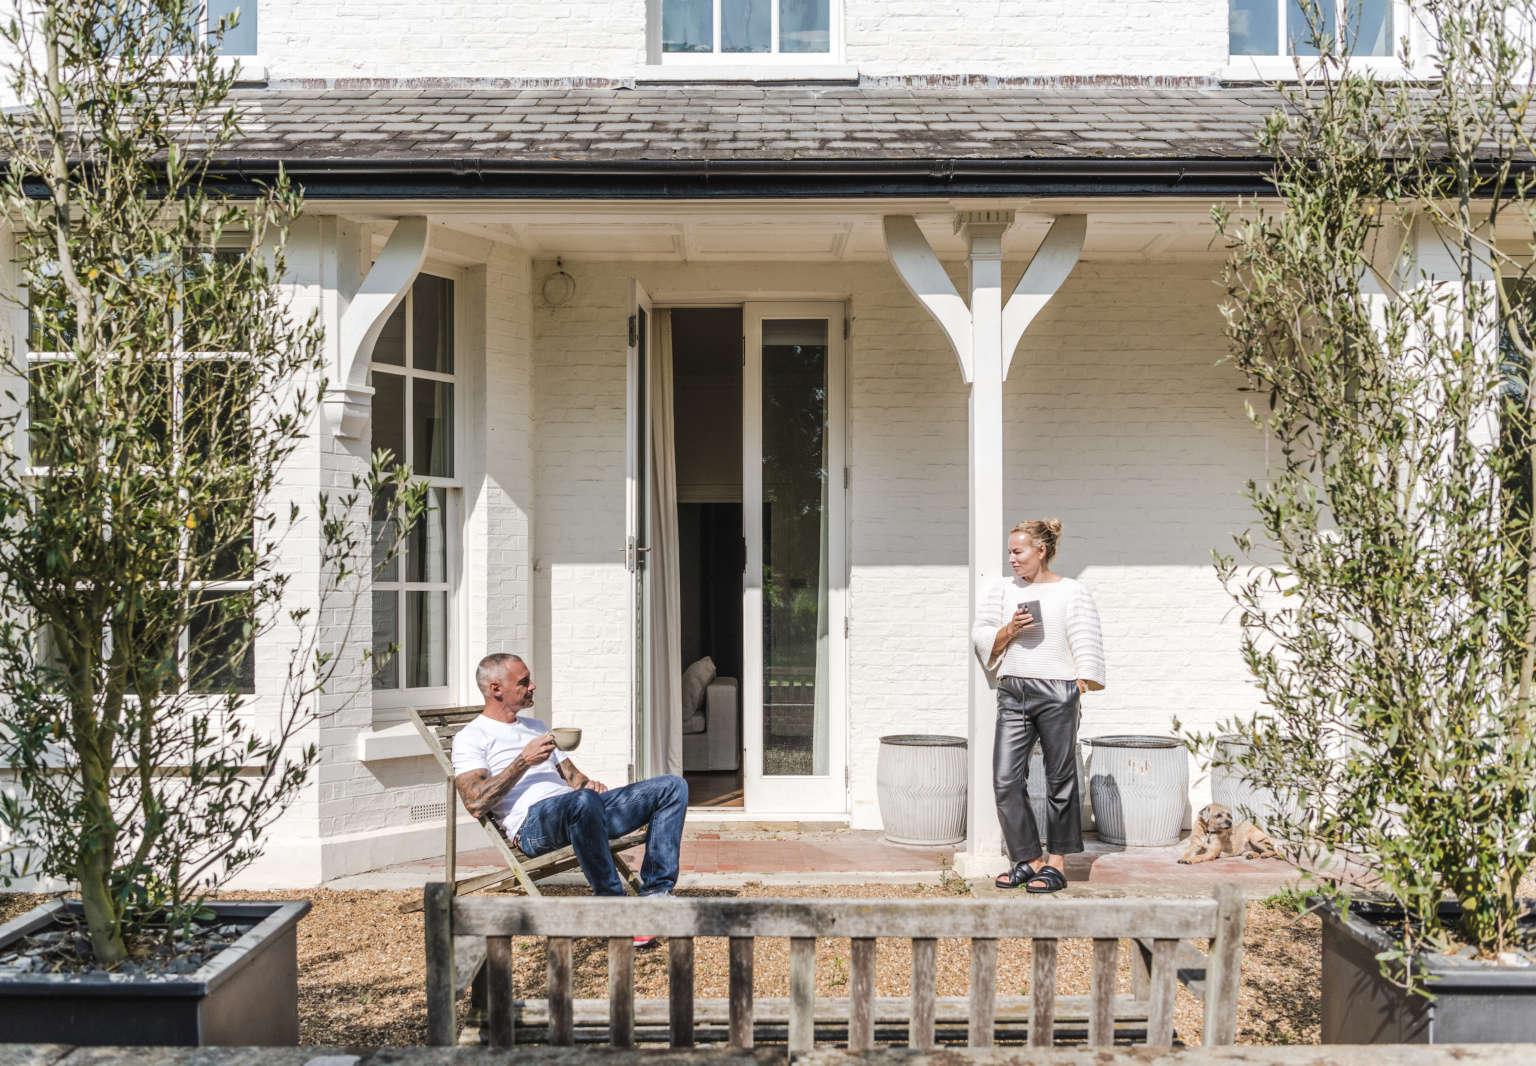 anna and willie mcdougall cambridgeshire estate via the modern house 1 1536x1066